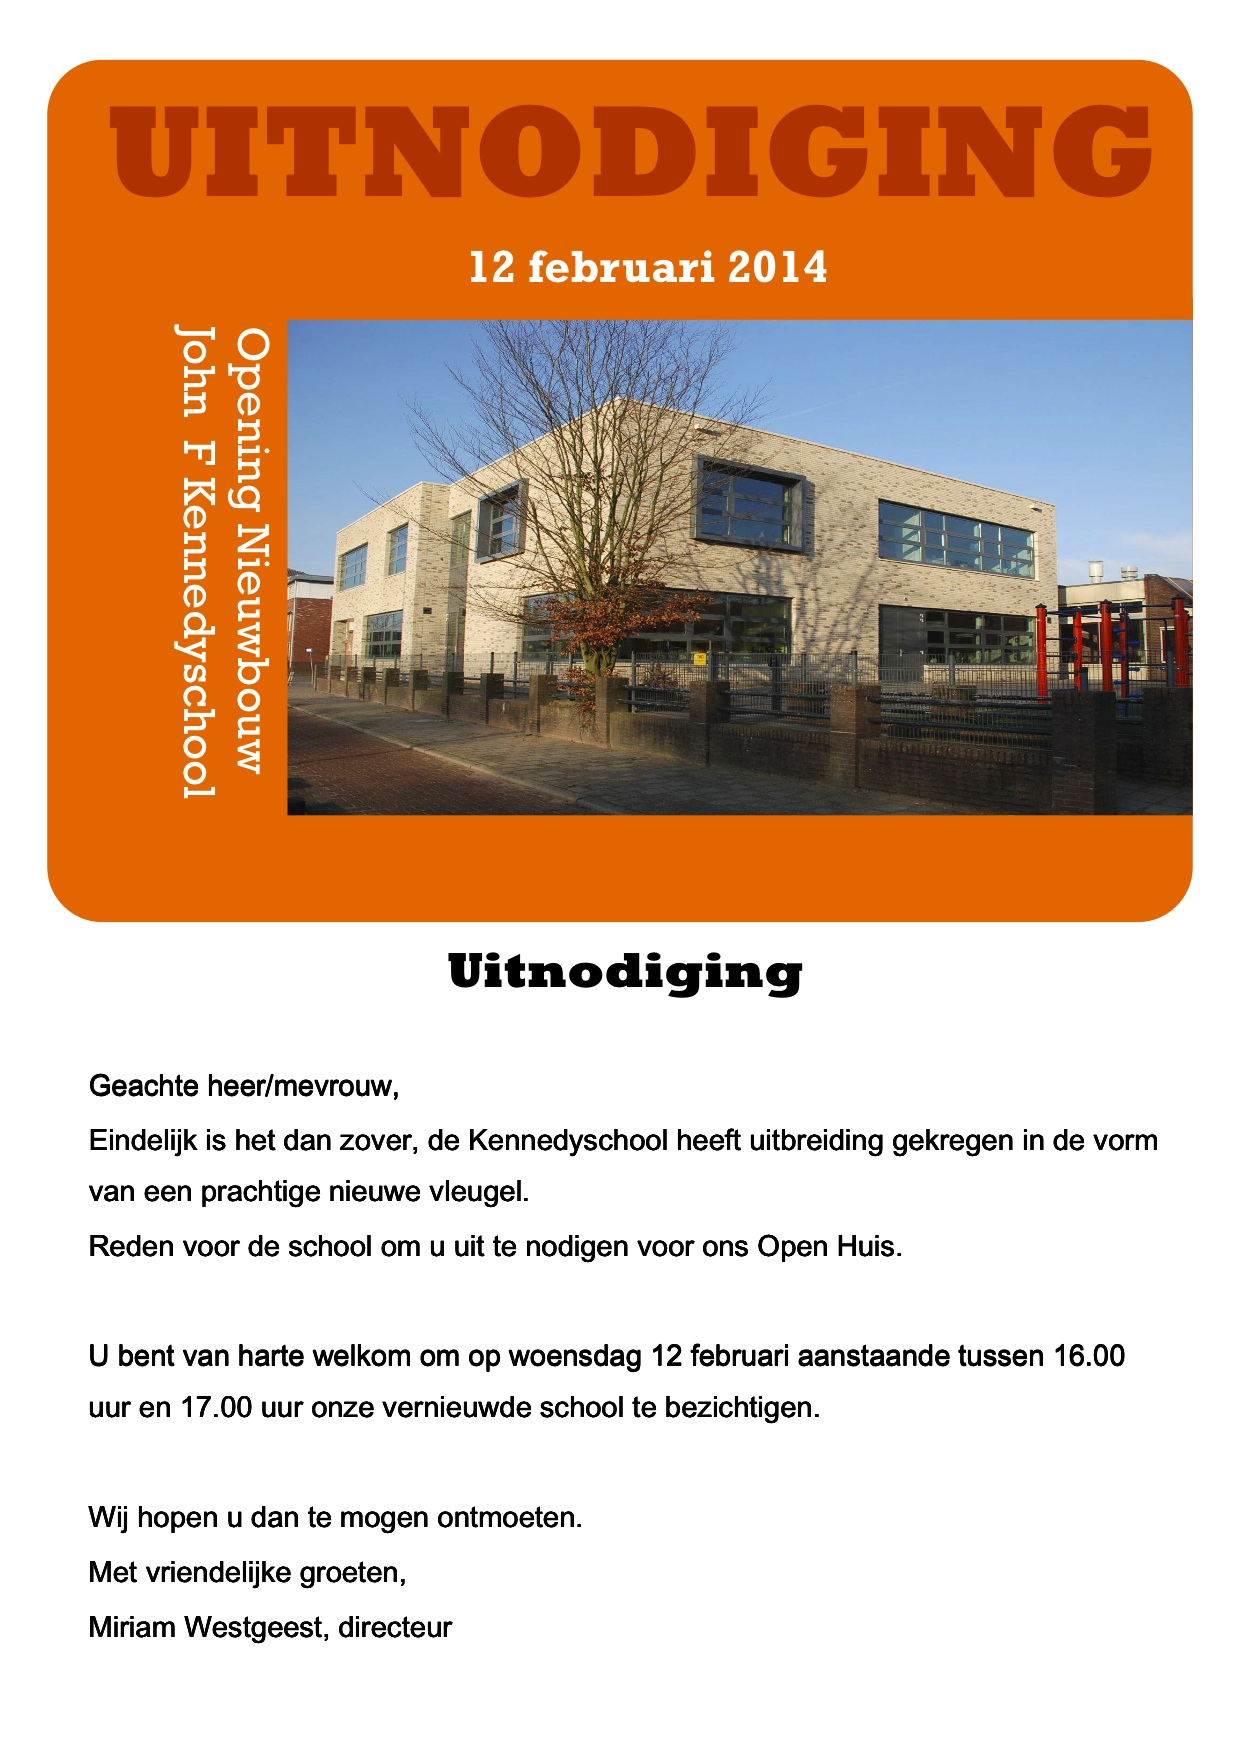 Flyer nieuwbouw 16 januari 2014 (1)